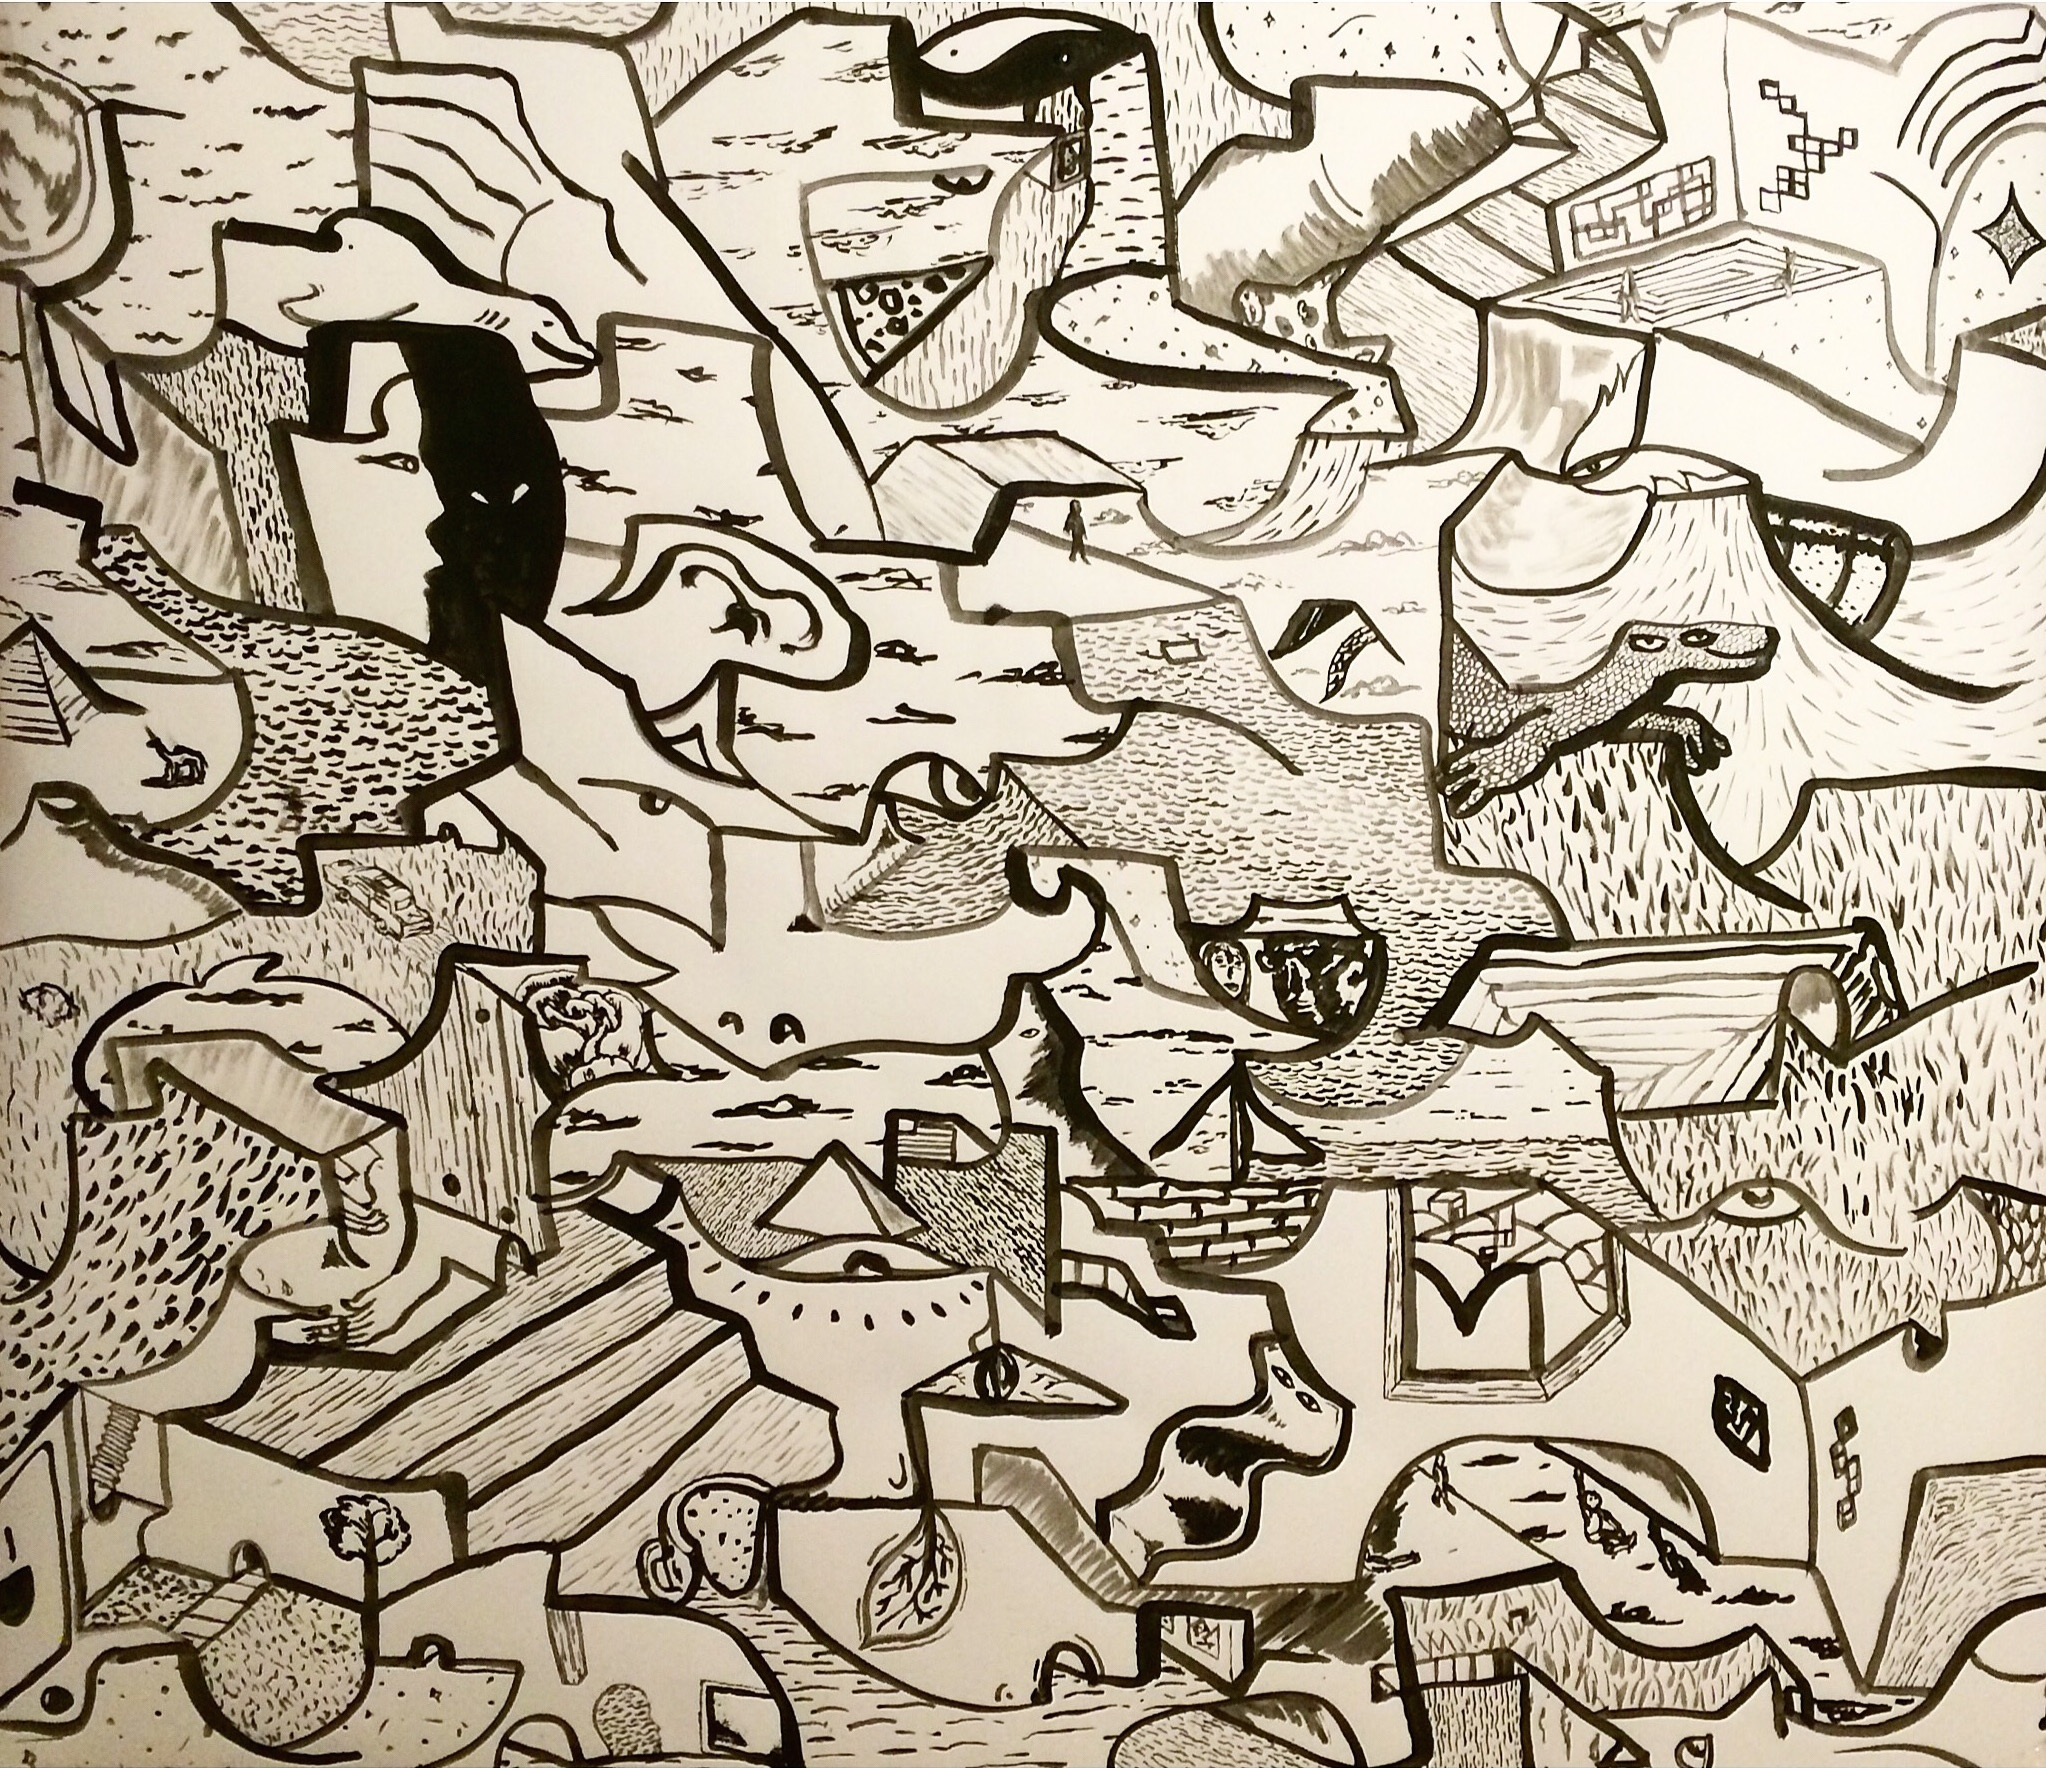 Alex Fatemi Living In The Fourth Dimension, 2015 Acylic on paper 24 x 24 inches $220